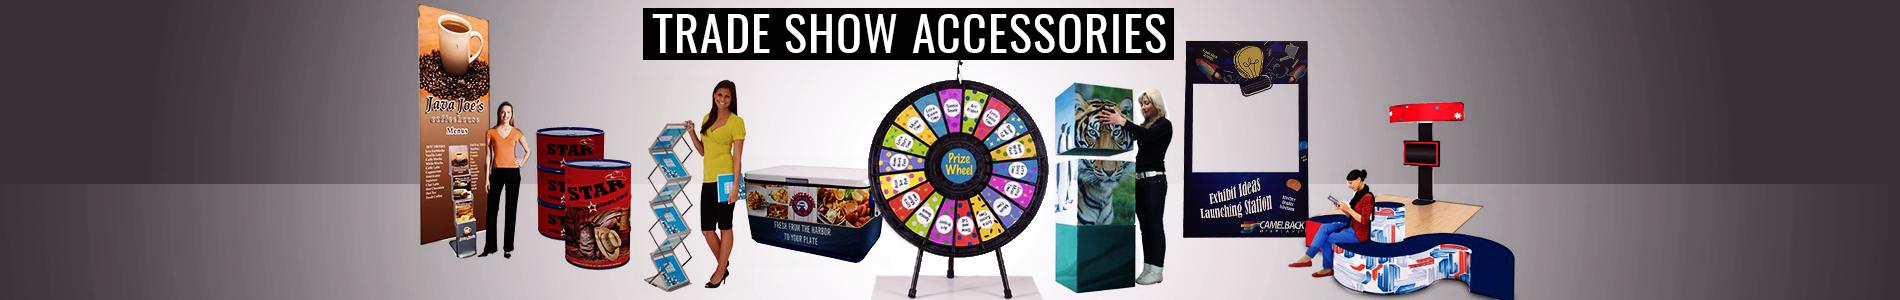 Trade Show Accessories